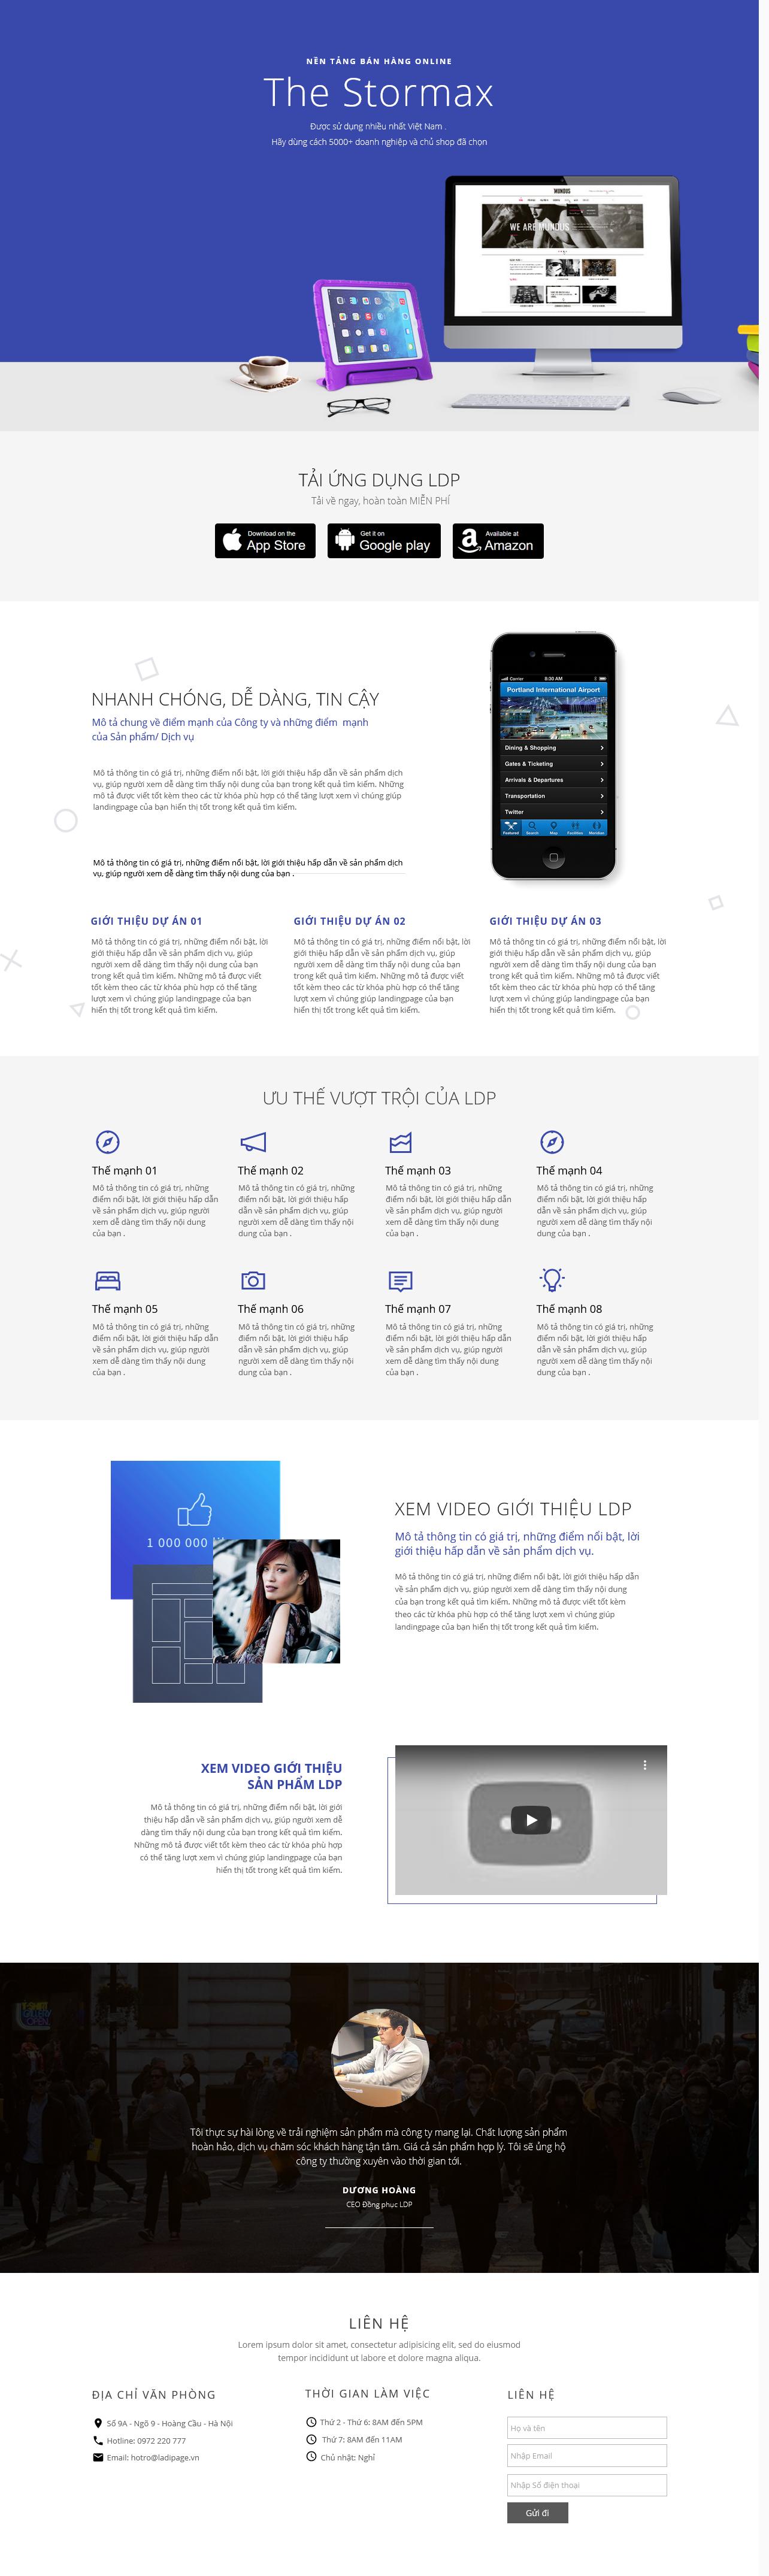 Thiết kế website Thiết kế webiste landingpage phan-mem---game---app Công nghệ 03